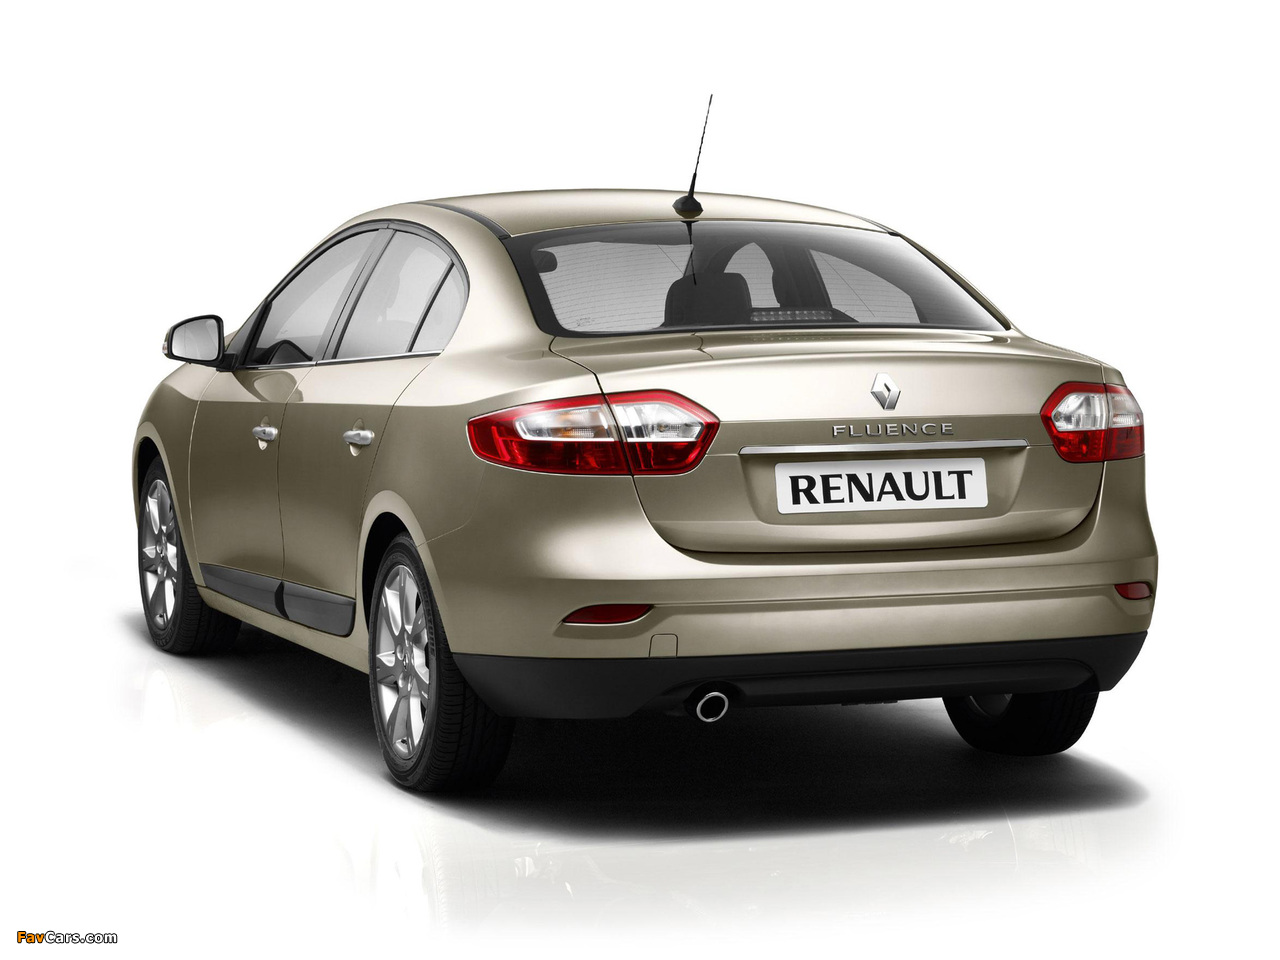 Renault Fluence 2009 photos (1280 x 960)